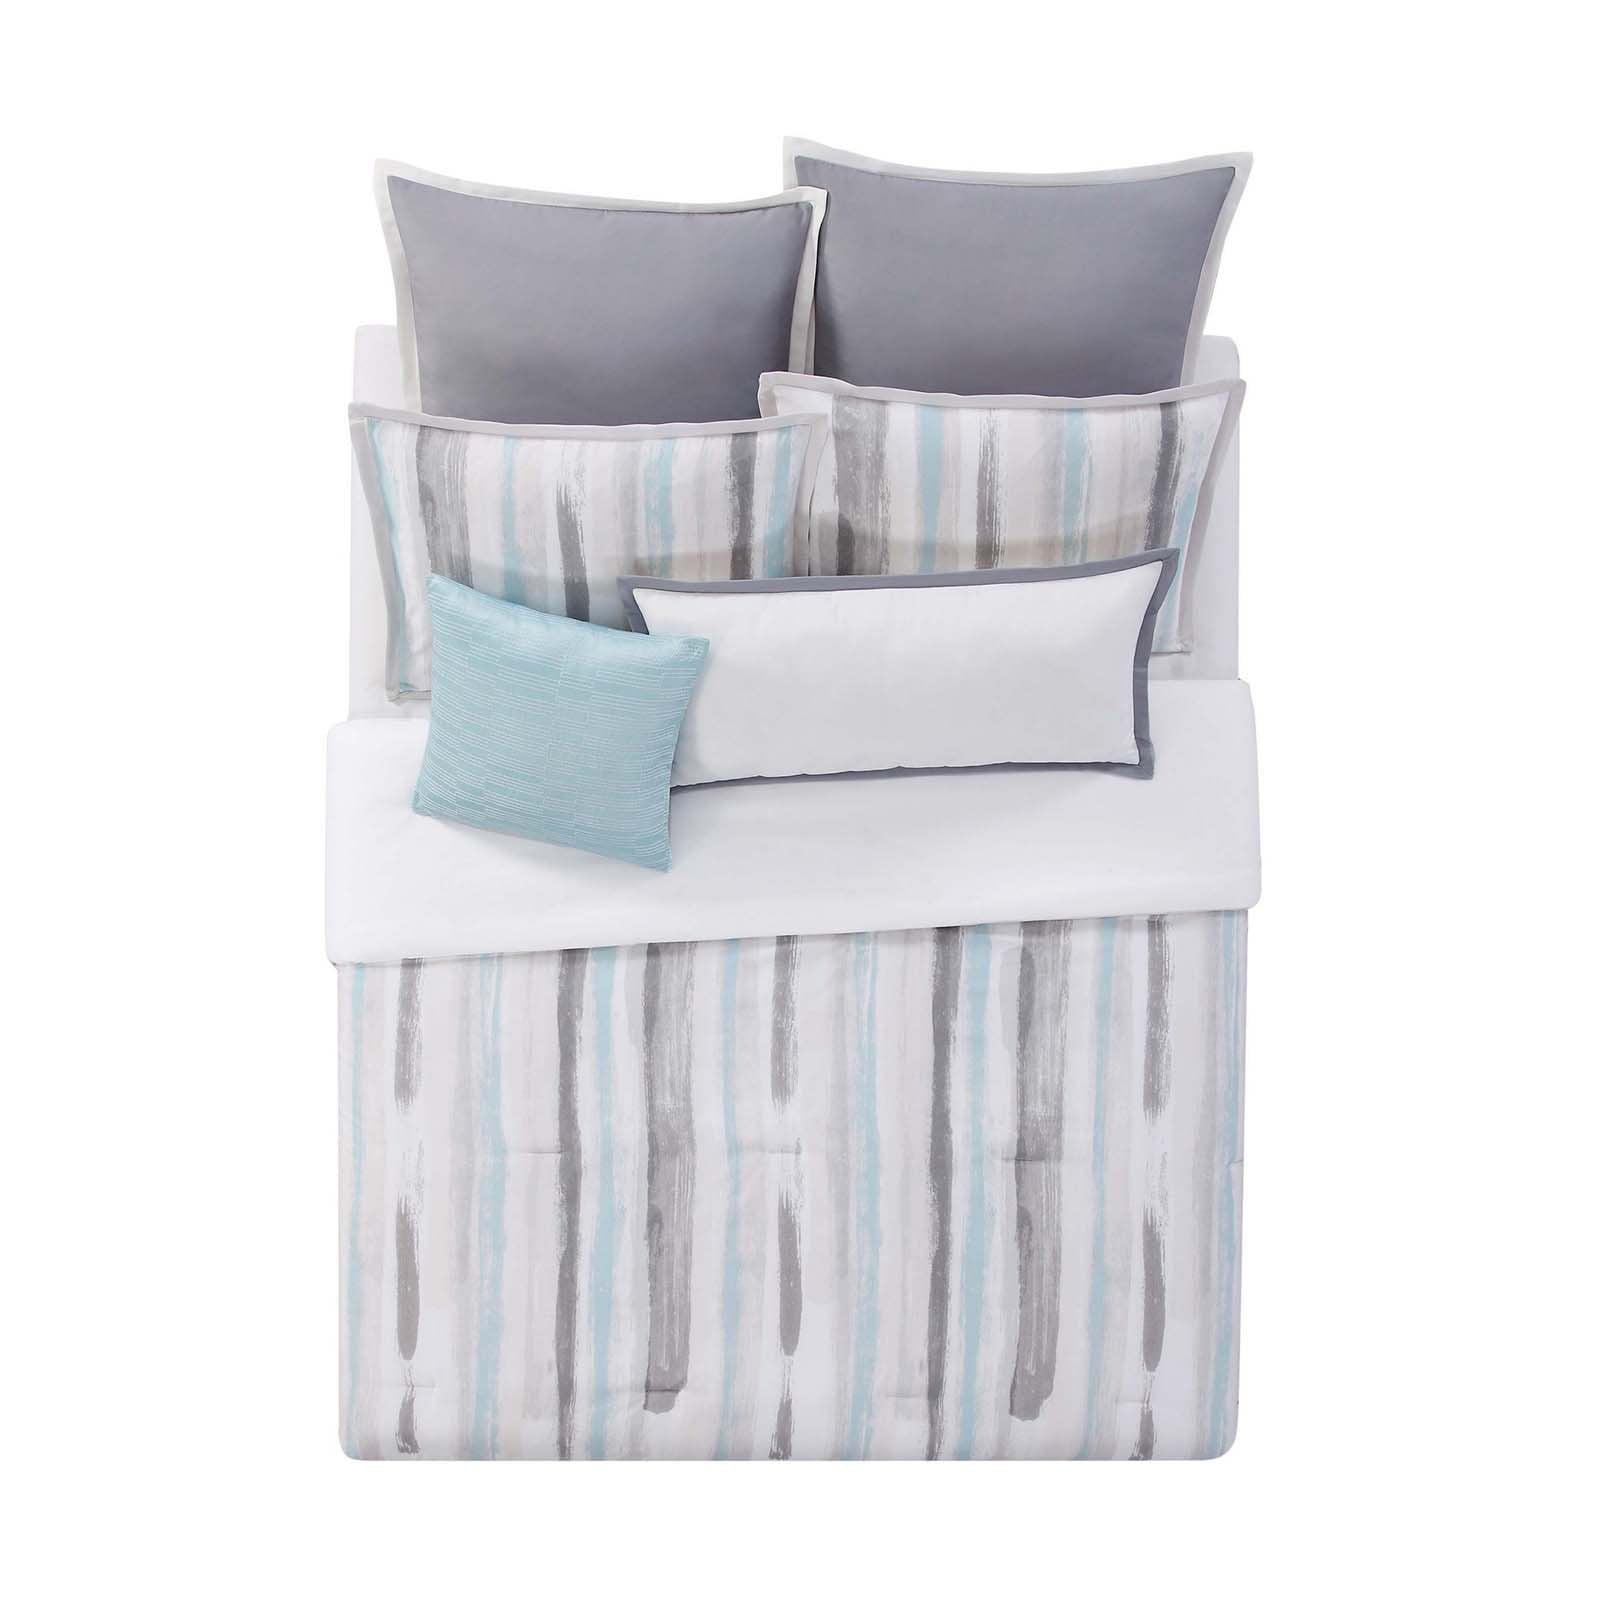 Sorrento Comforter Set by Vince Camuto